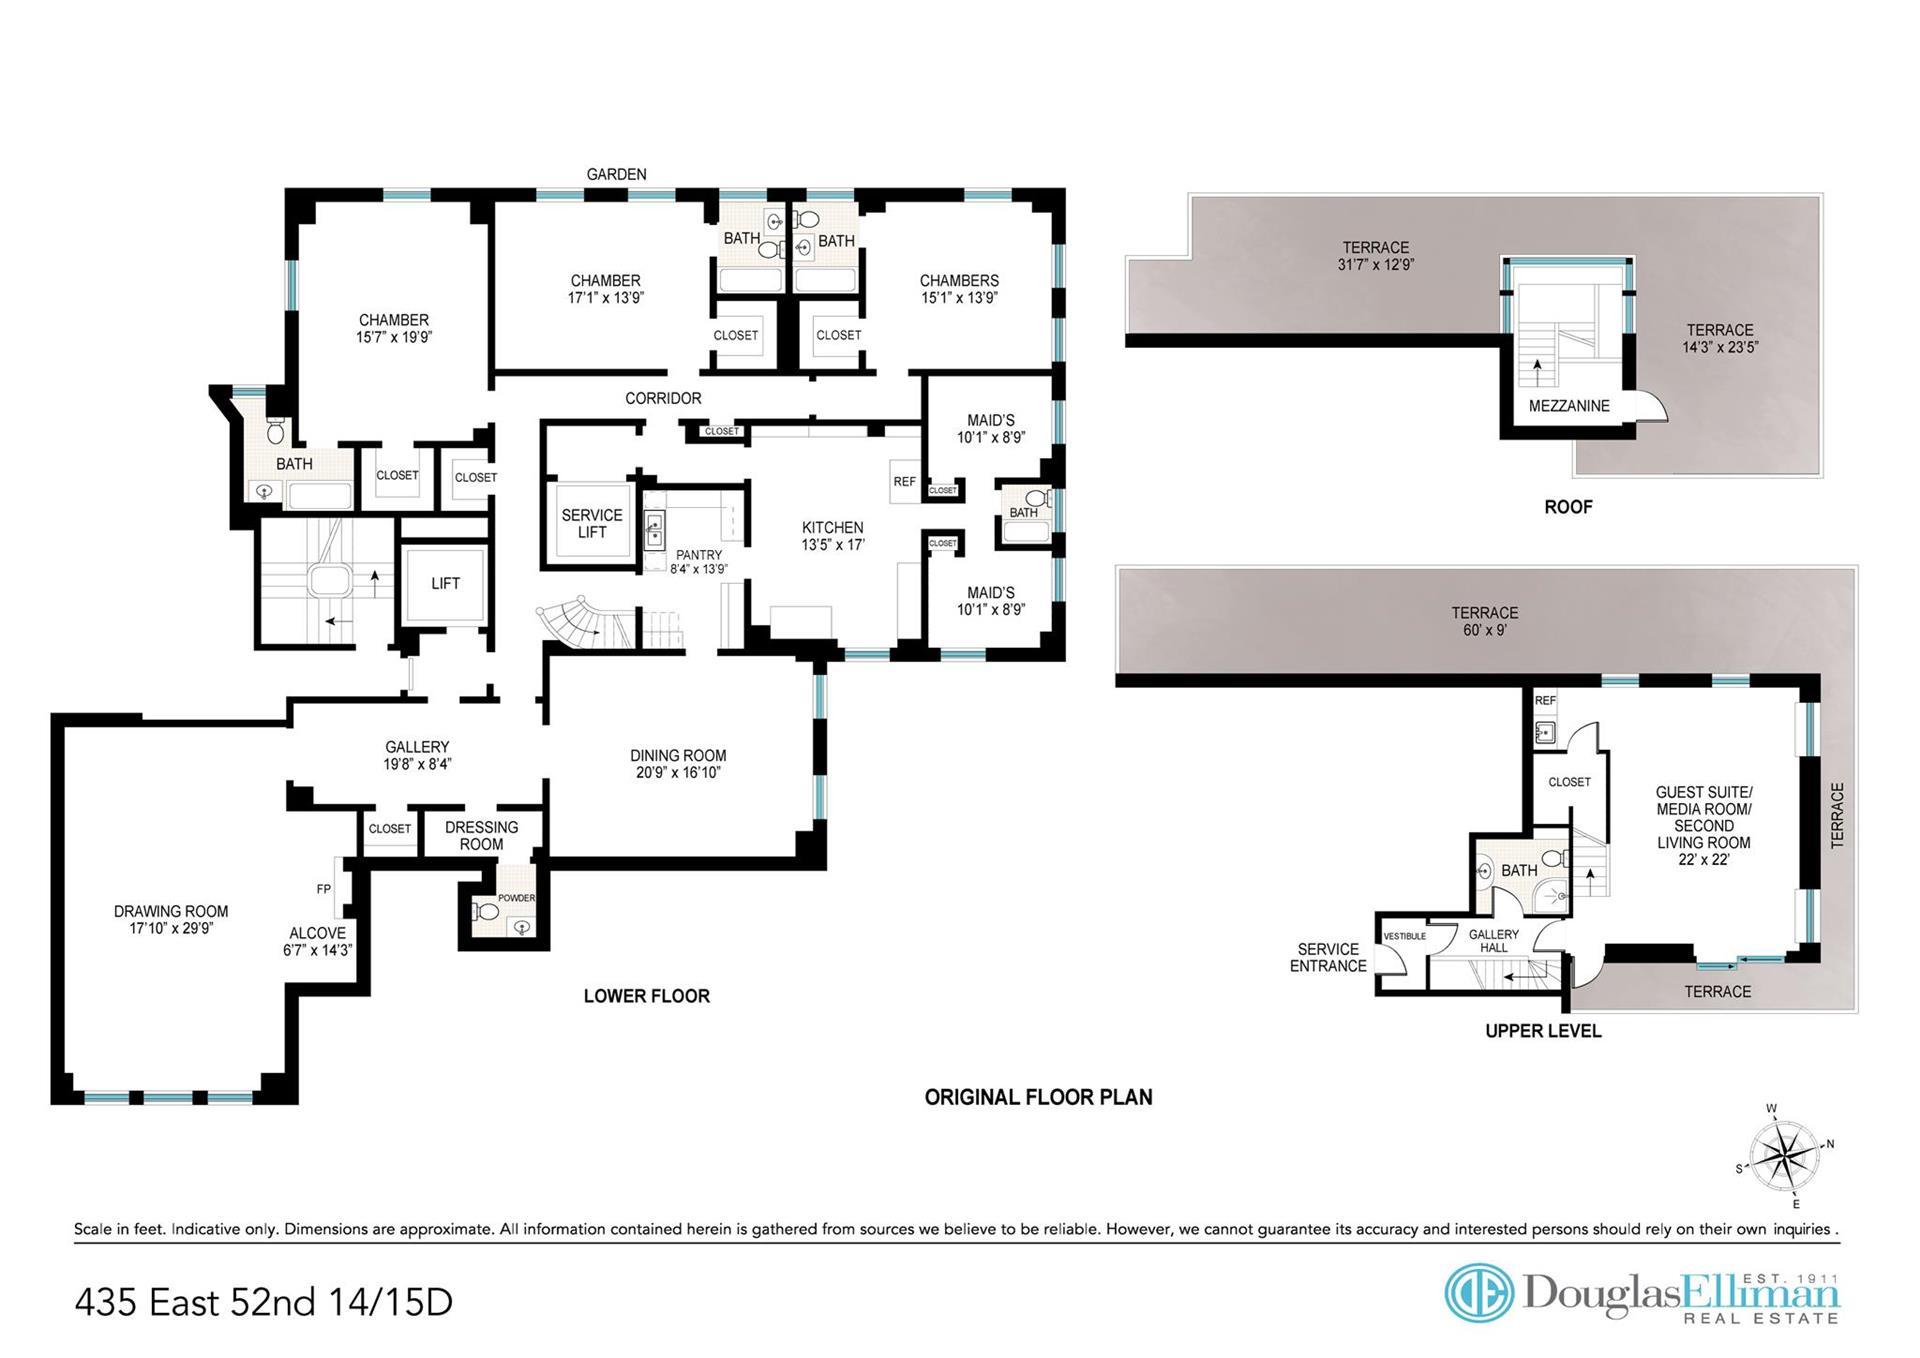 Floor plan of RIVER HOUSE, 435 East 52nd Street, 14/15D - Beekman, New York